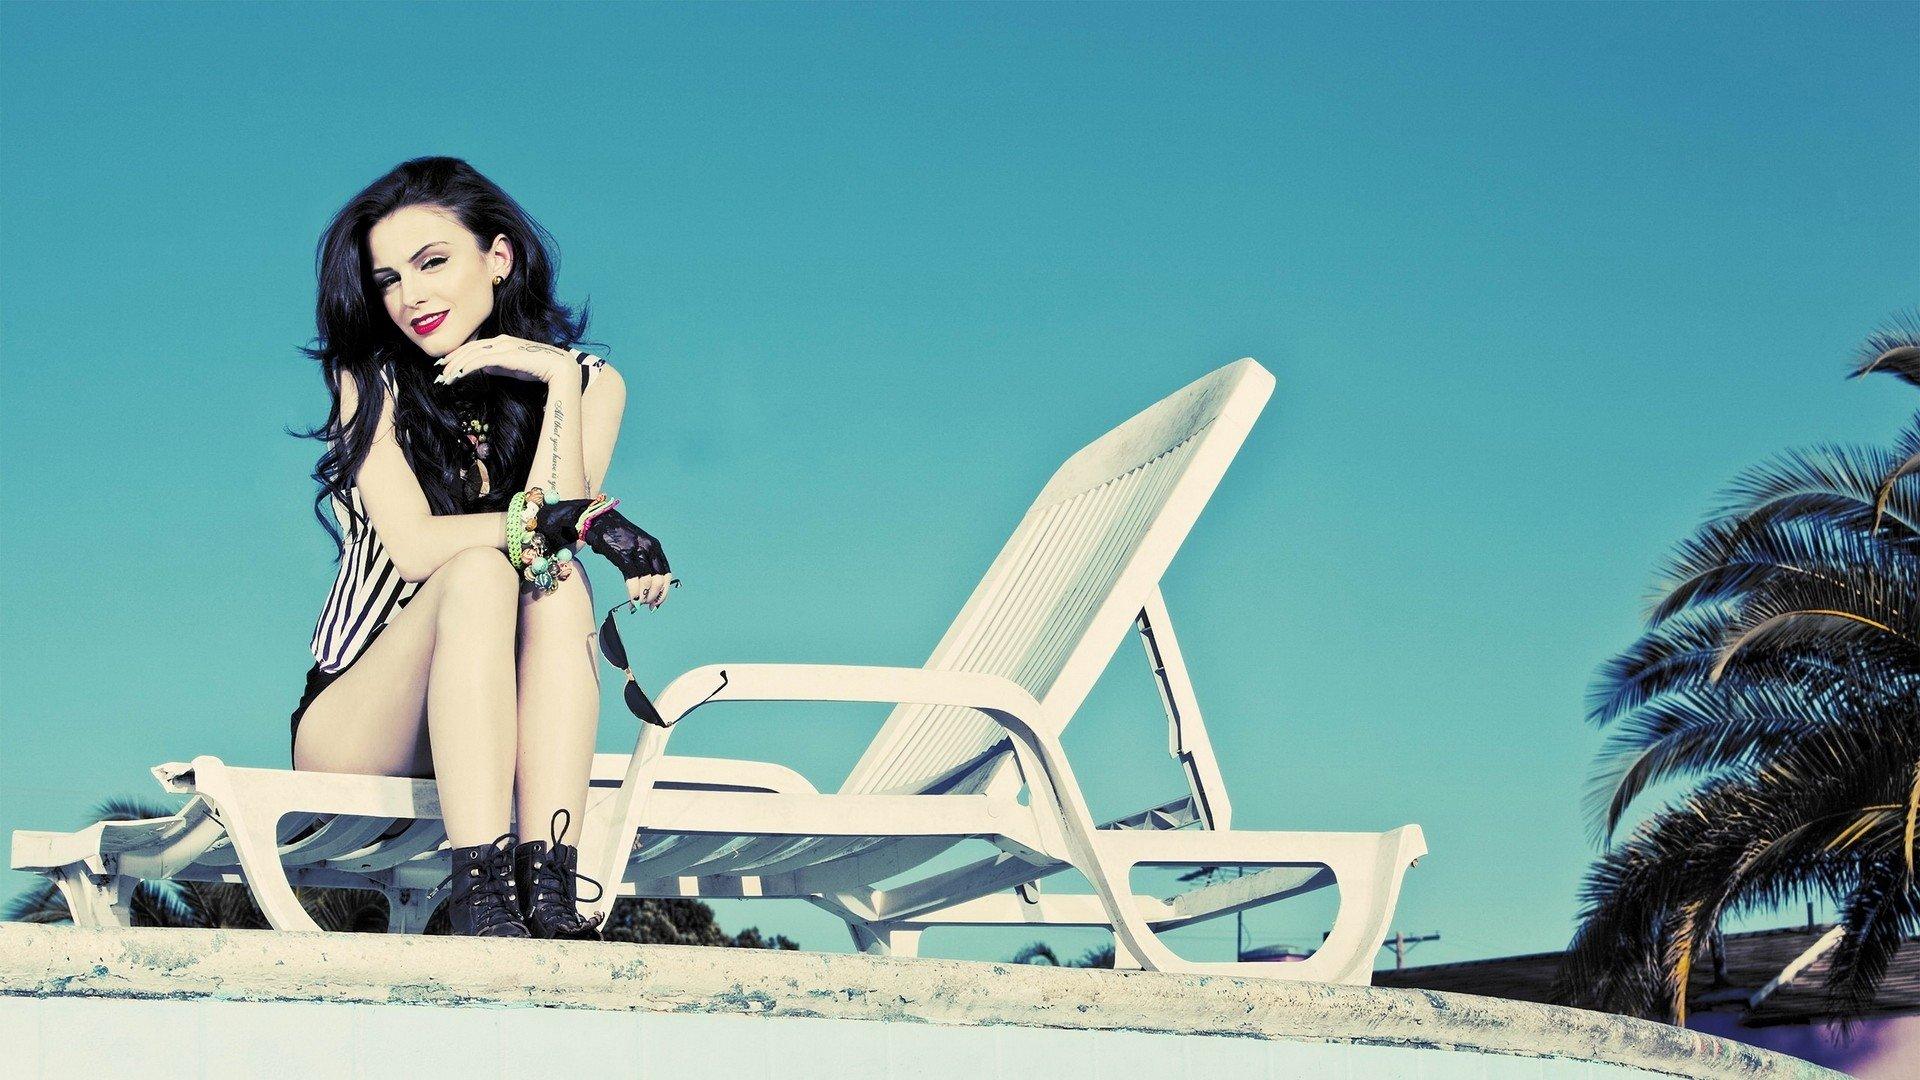 Cher Lloyd Hd Wallpaper Background Image 19x1080 Id Wallpaper Abyss